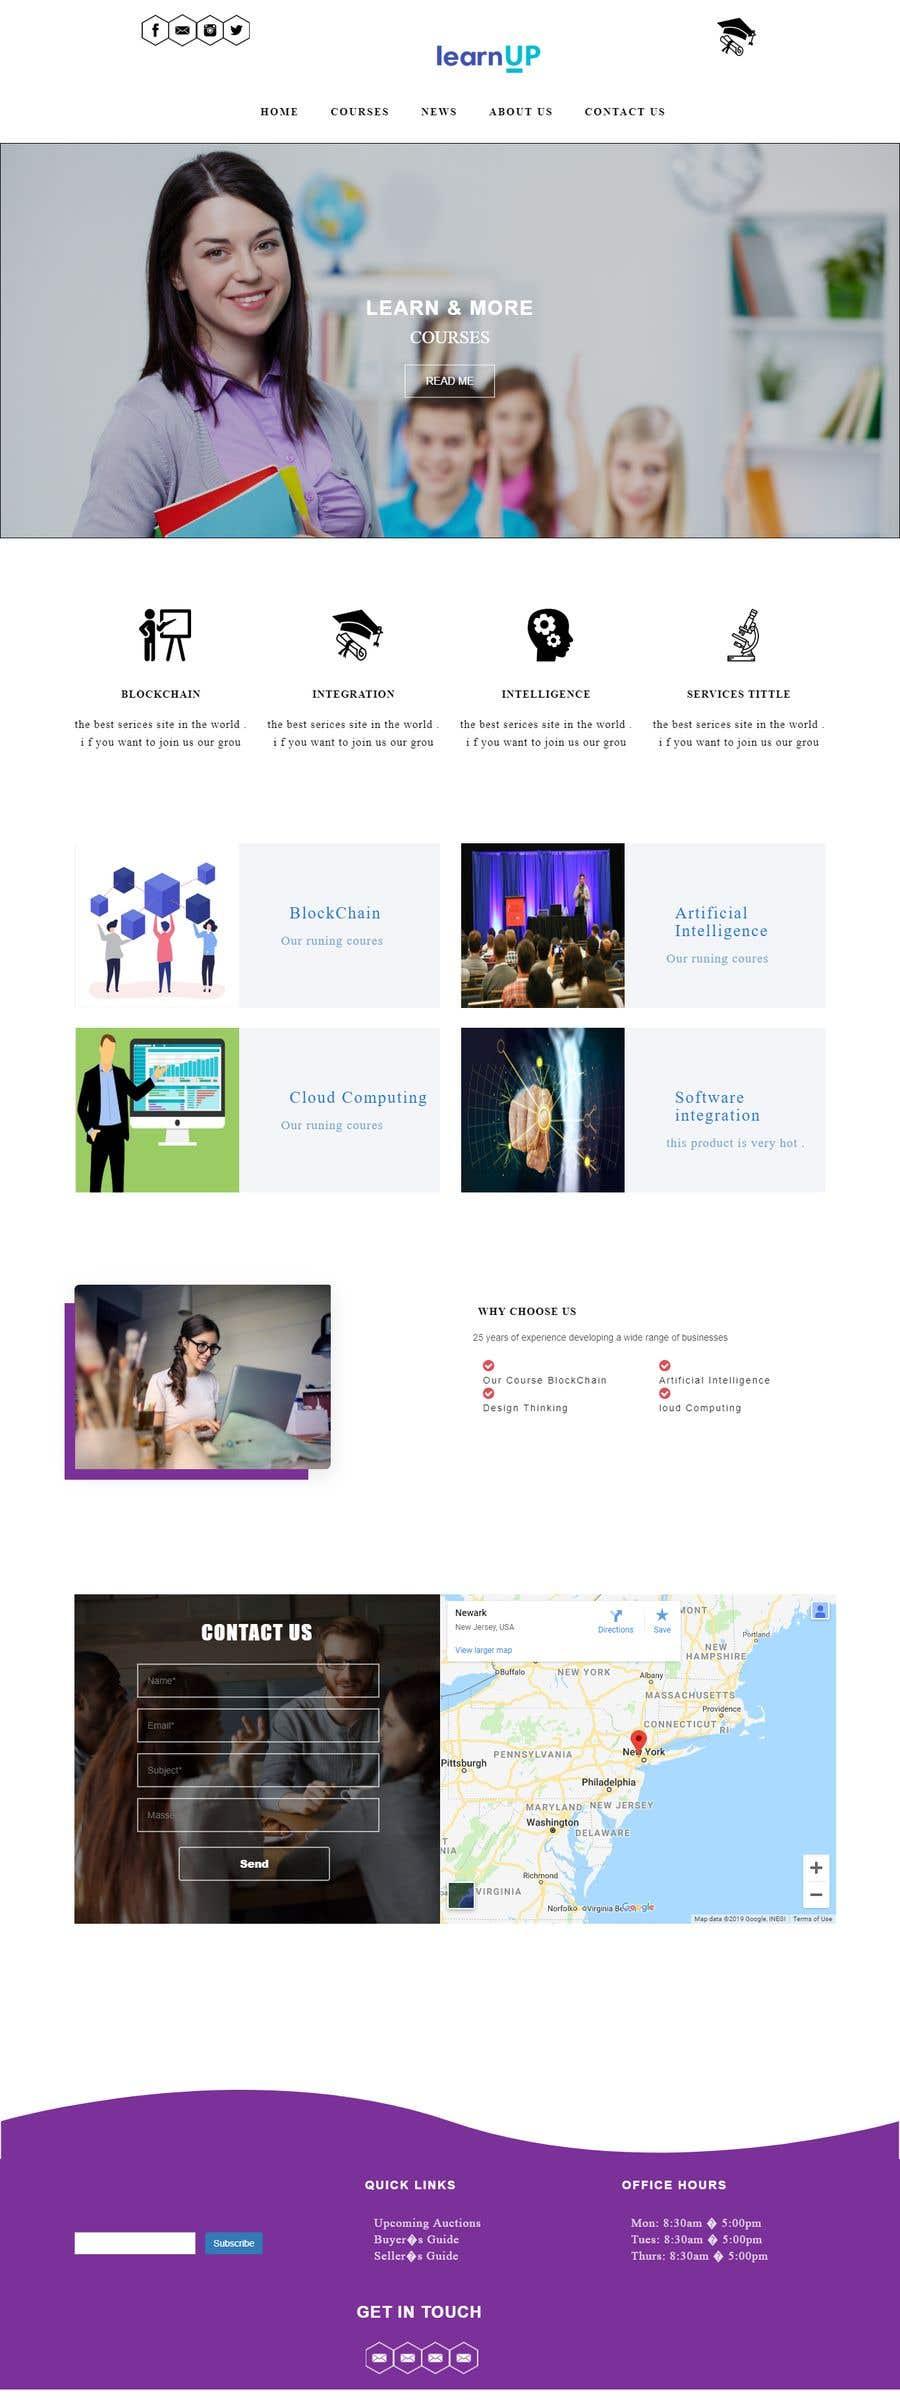 Penyertaan Peraduan #17 untuk Educational organization needs a website design